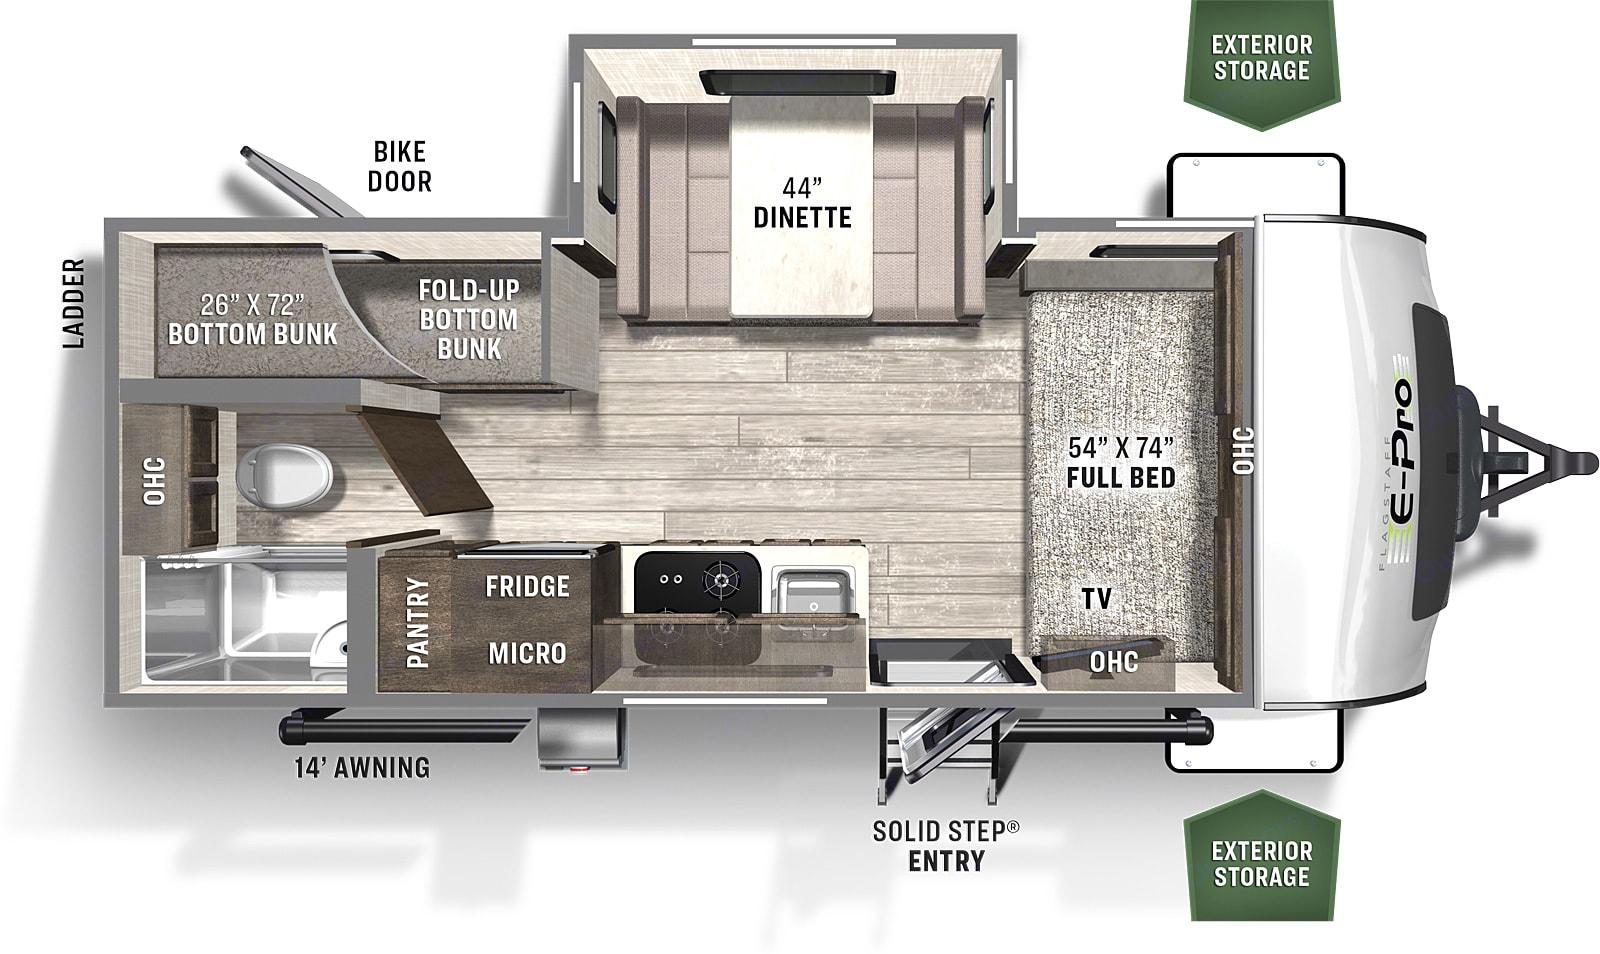 Flagstaff E-Pro 2021